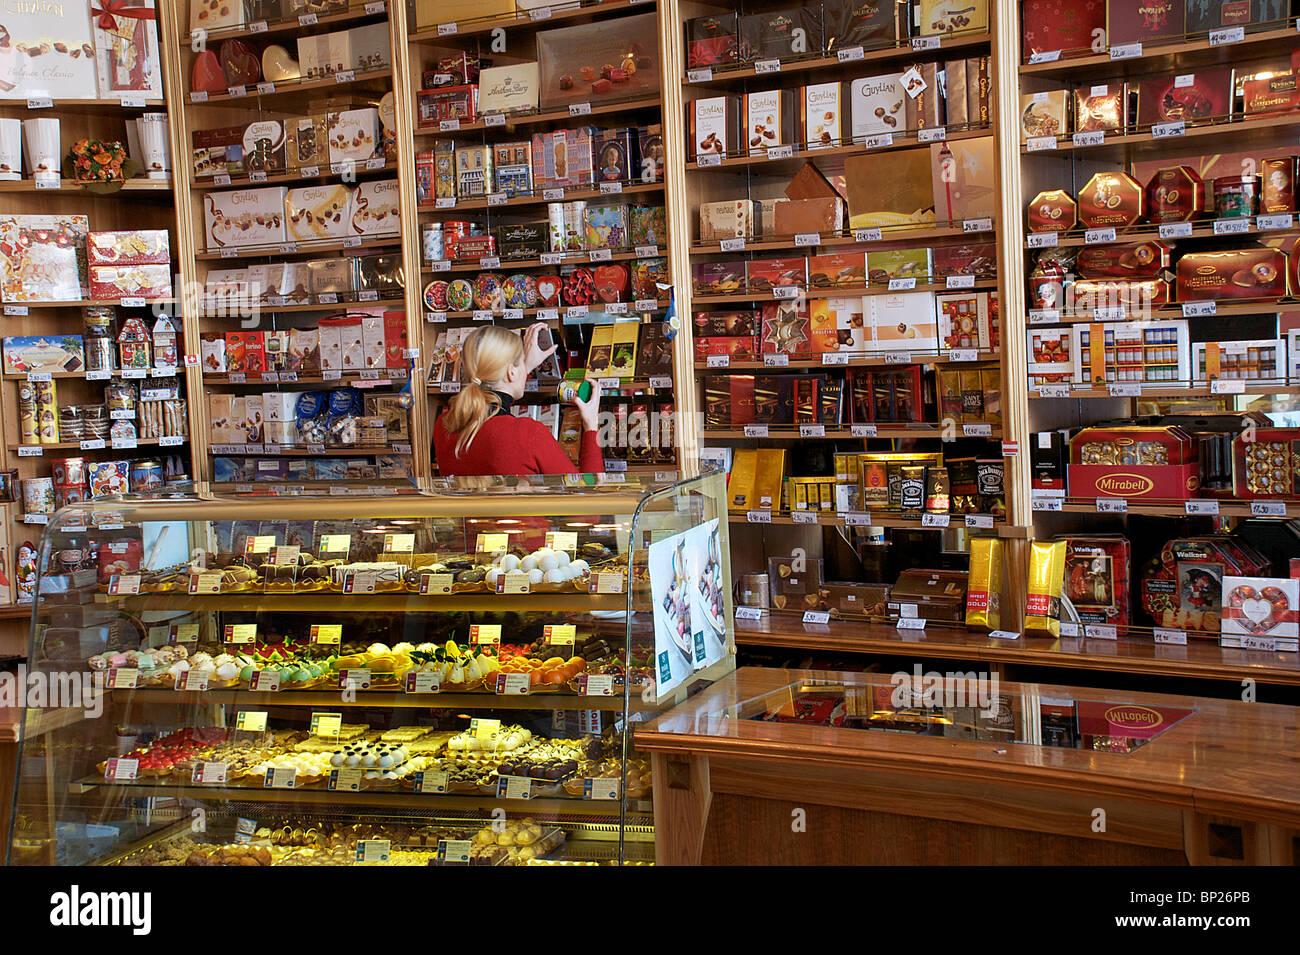 CHOCOLATE SHOP INTERIOR, BRATISLAVA, SLOVAKIA Stock Photo, Royalty ...